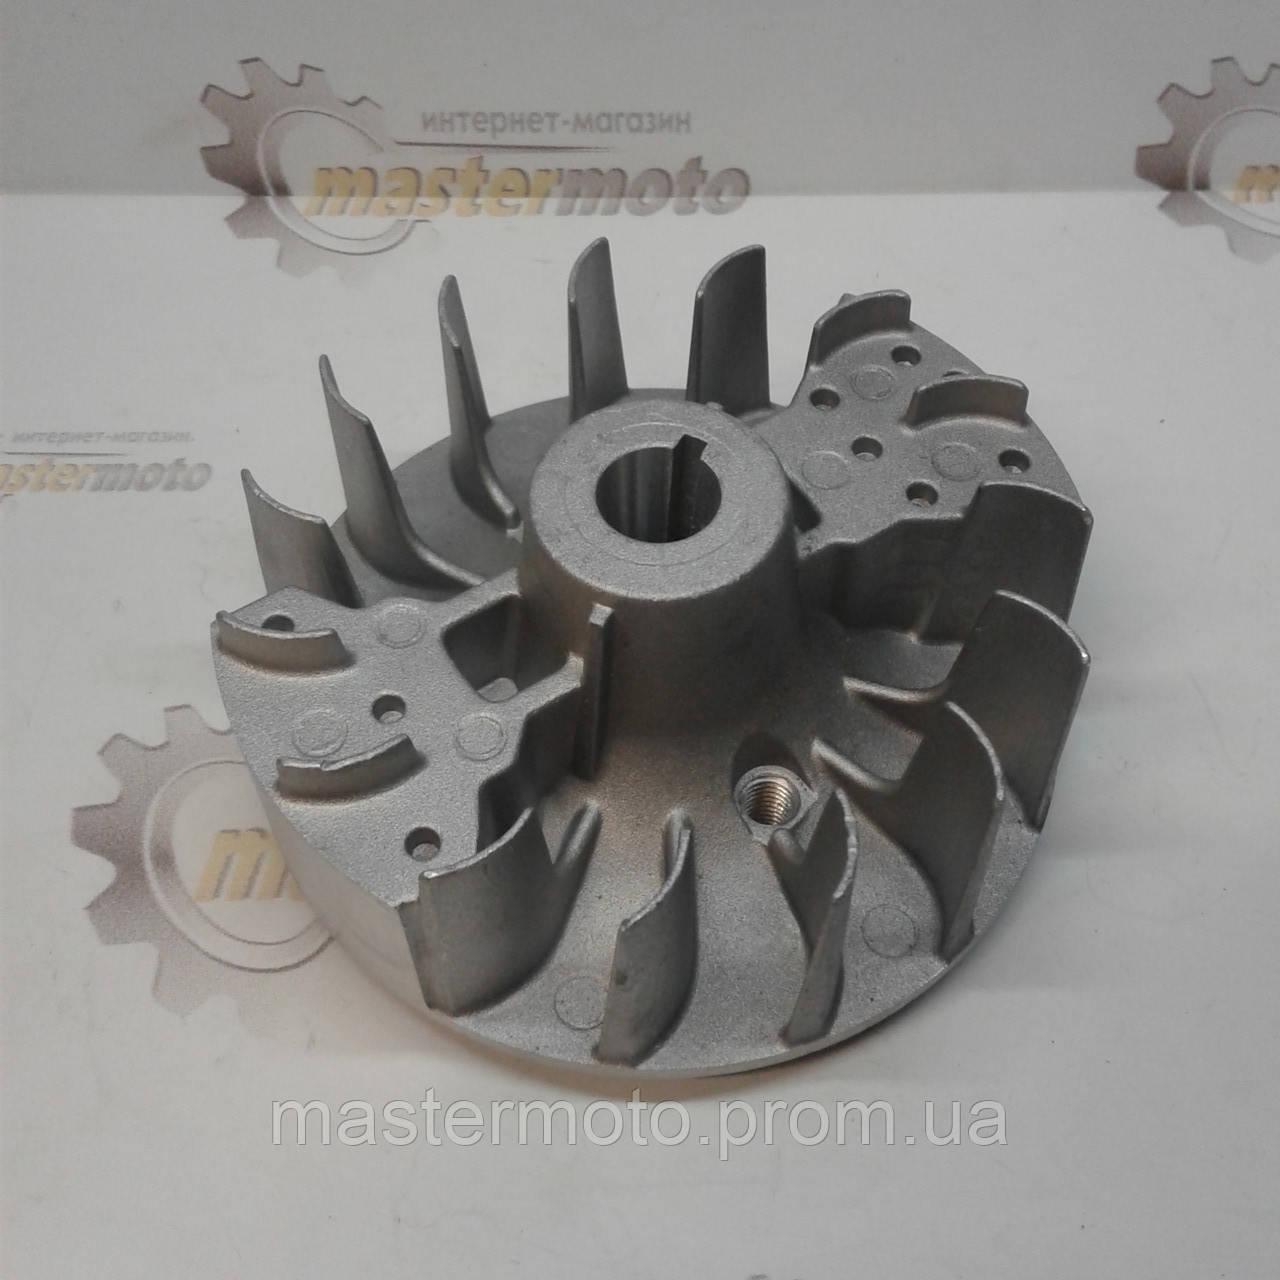 Ротор магнето 40/44мм для триммера